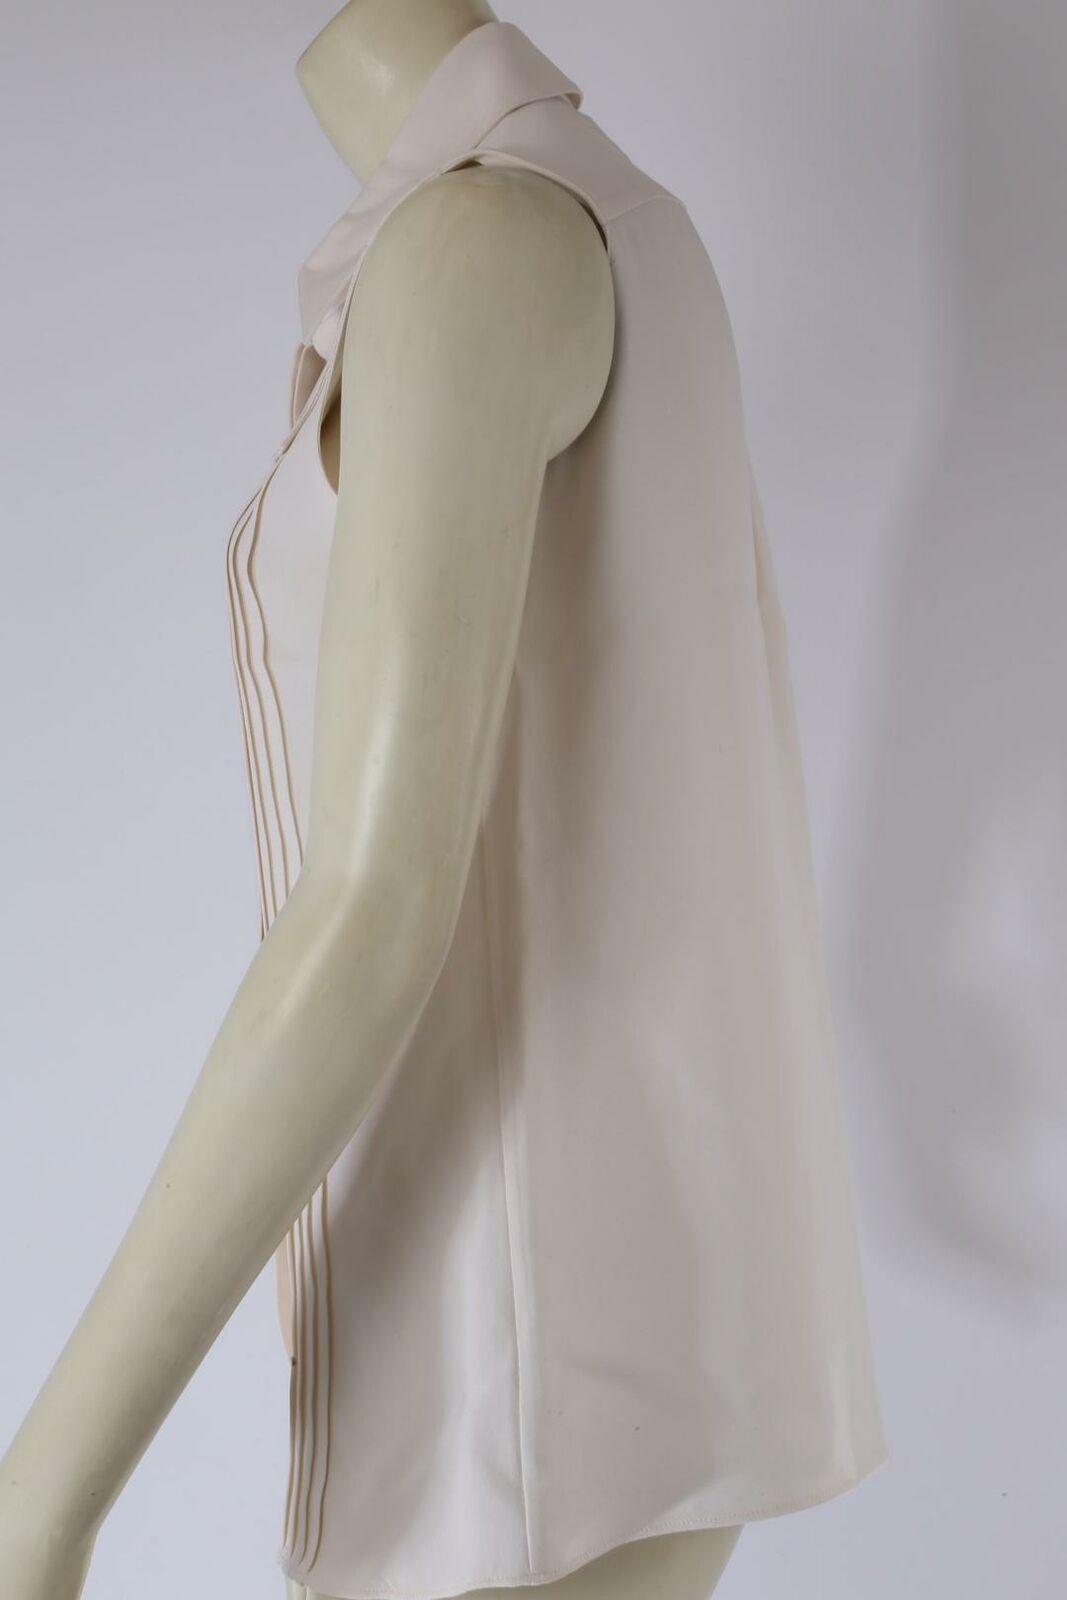 DEREK LAM Ivory Sleeveless Collared Silk Pleated … - image 5